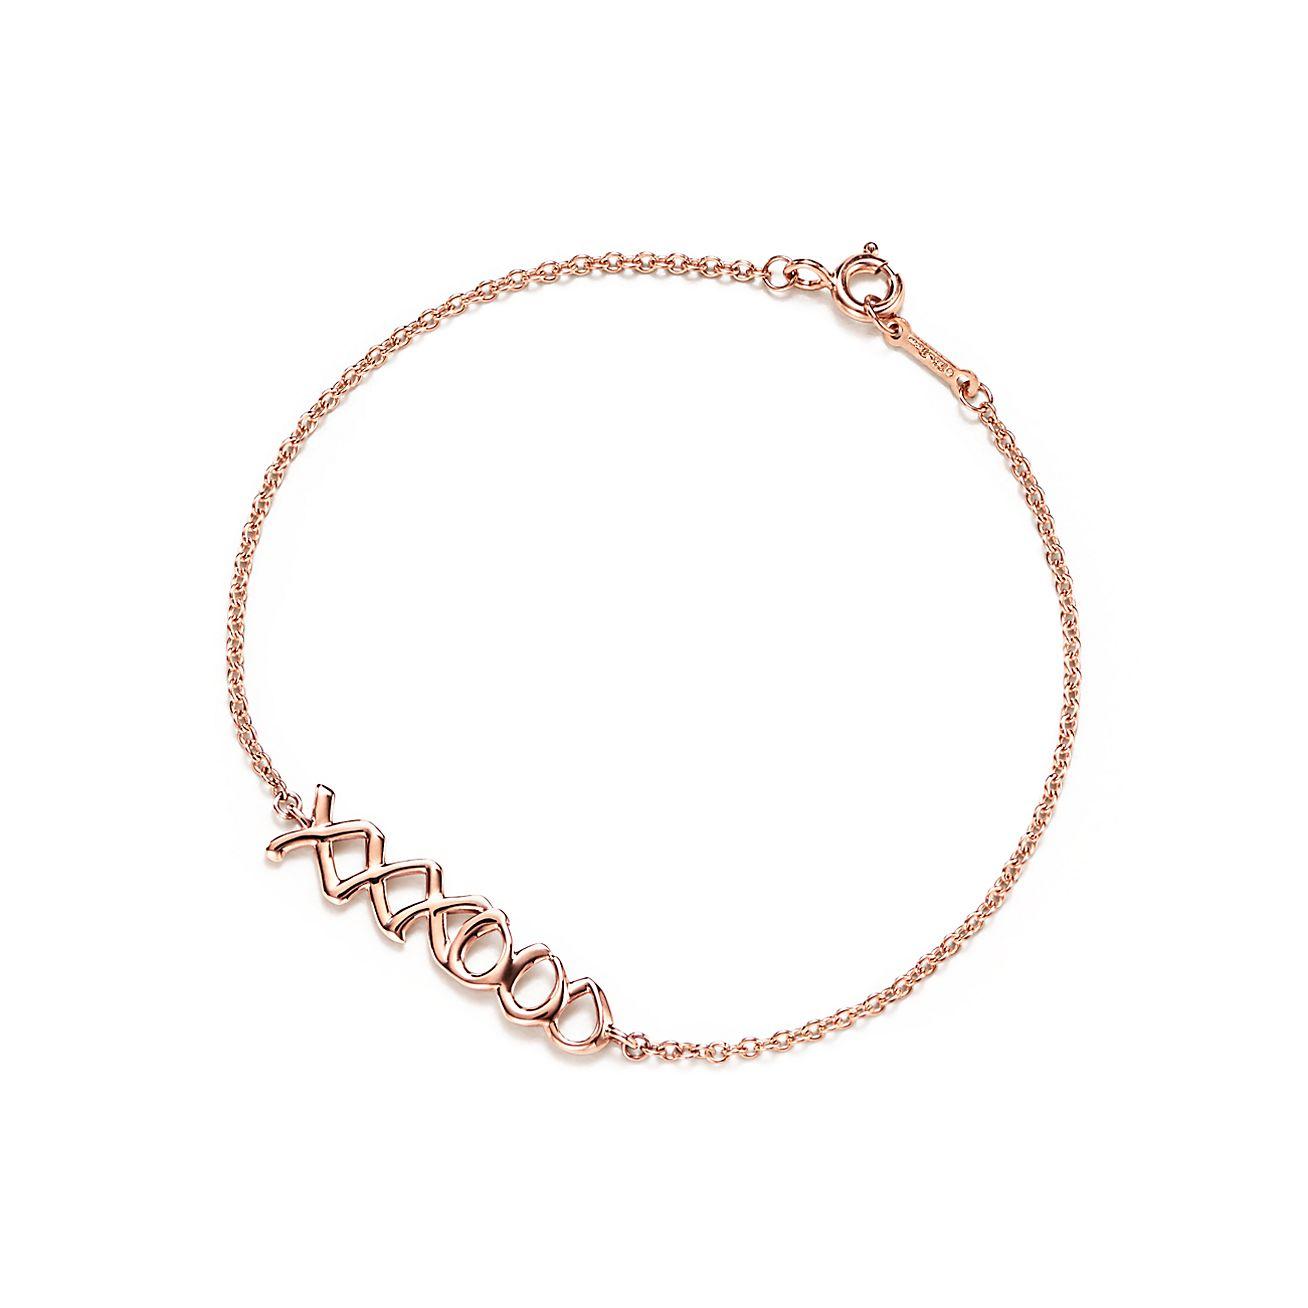 Palomas Graffiti love bracelet in 18k gold, medium Tiffany & Co.